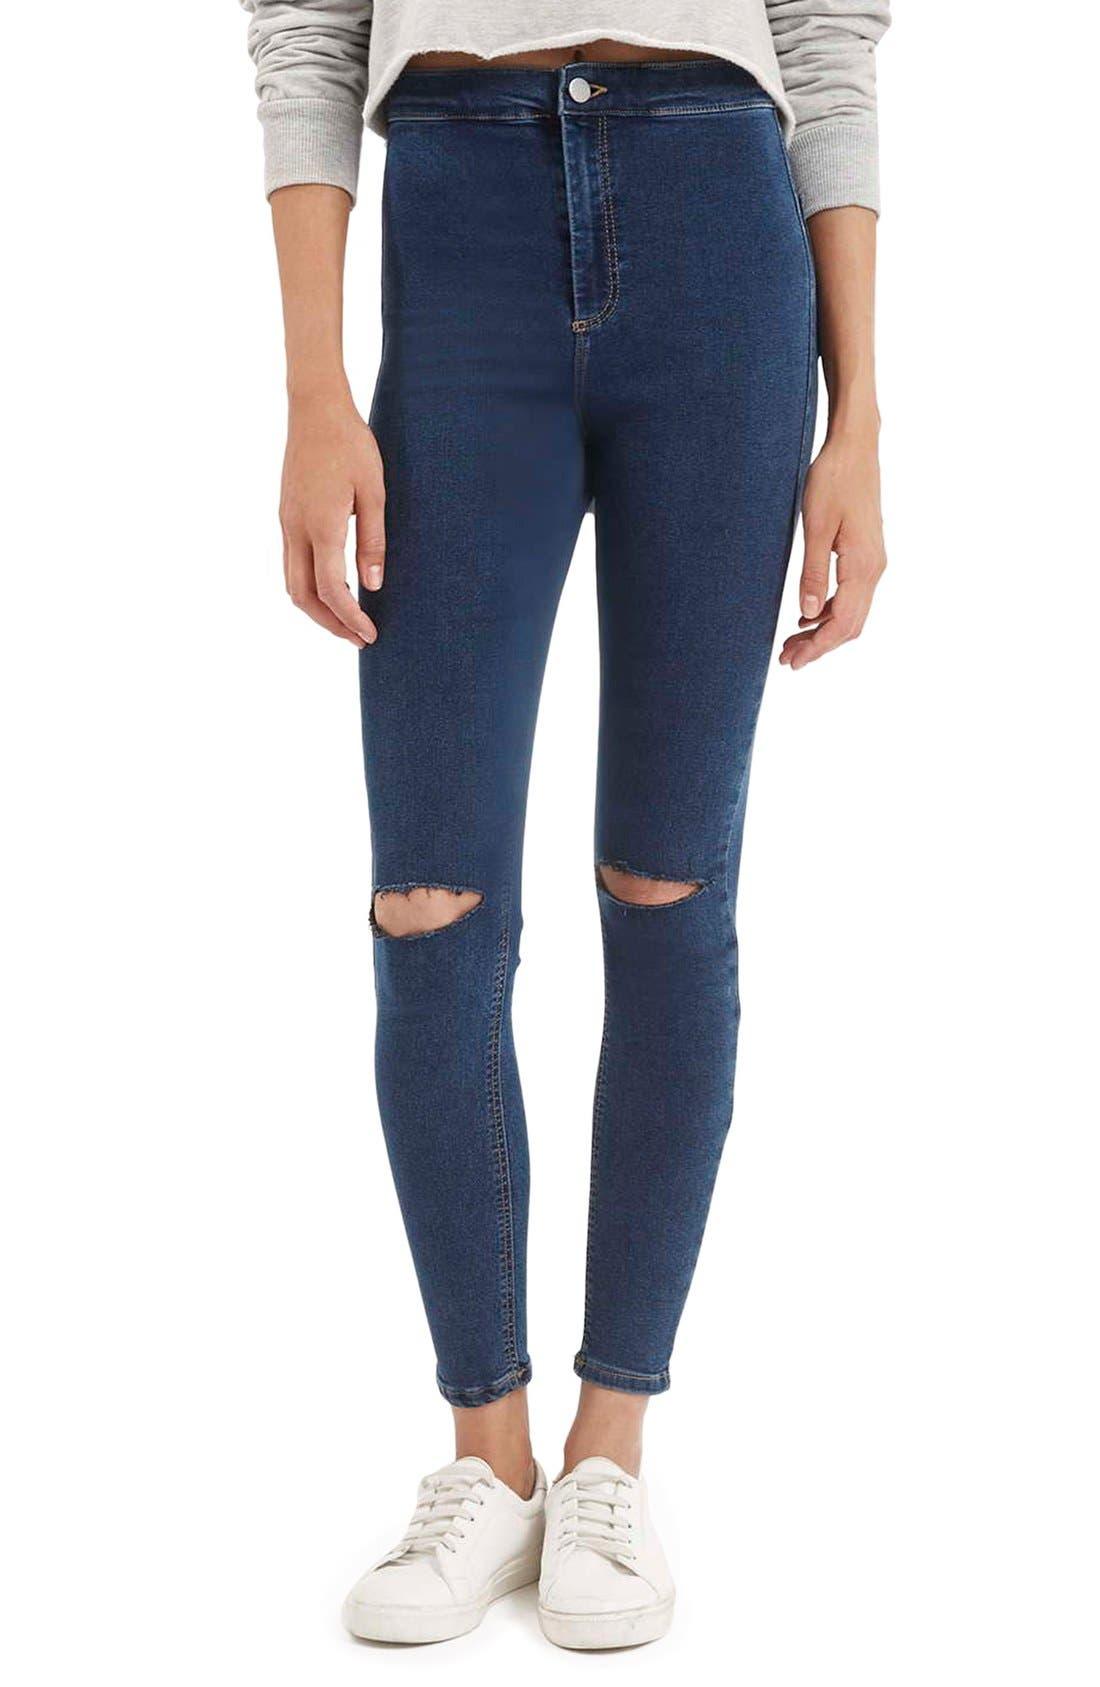 Main Image - Topshop Moto'Joni' Ripped High Rise Skinny Jeans (Regular & Short)